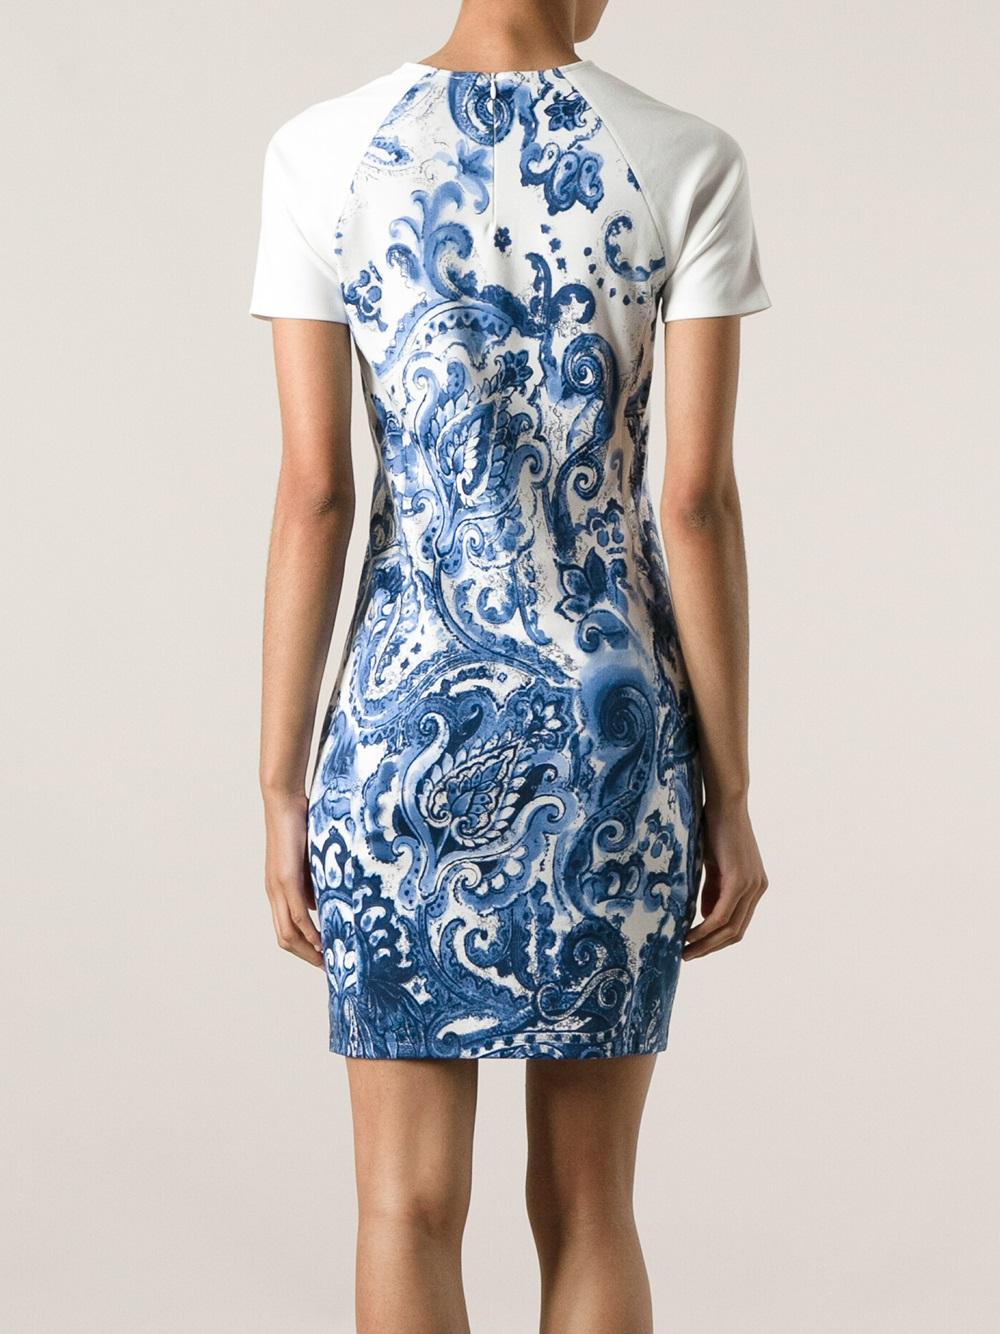 Lyst Ralph Lauren Black Label Fitted Floral Print Dress